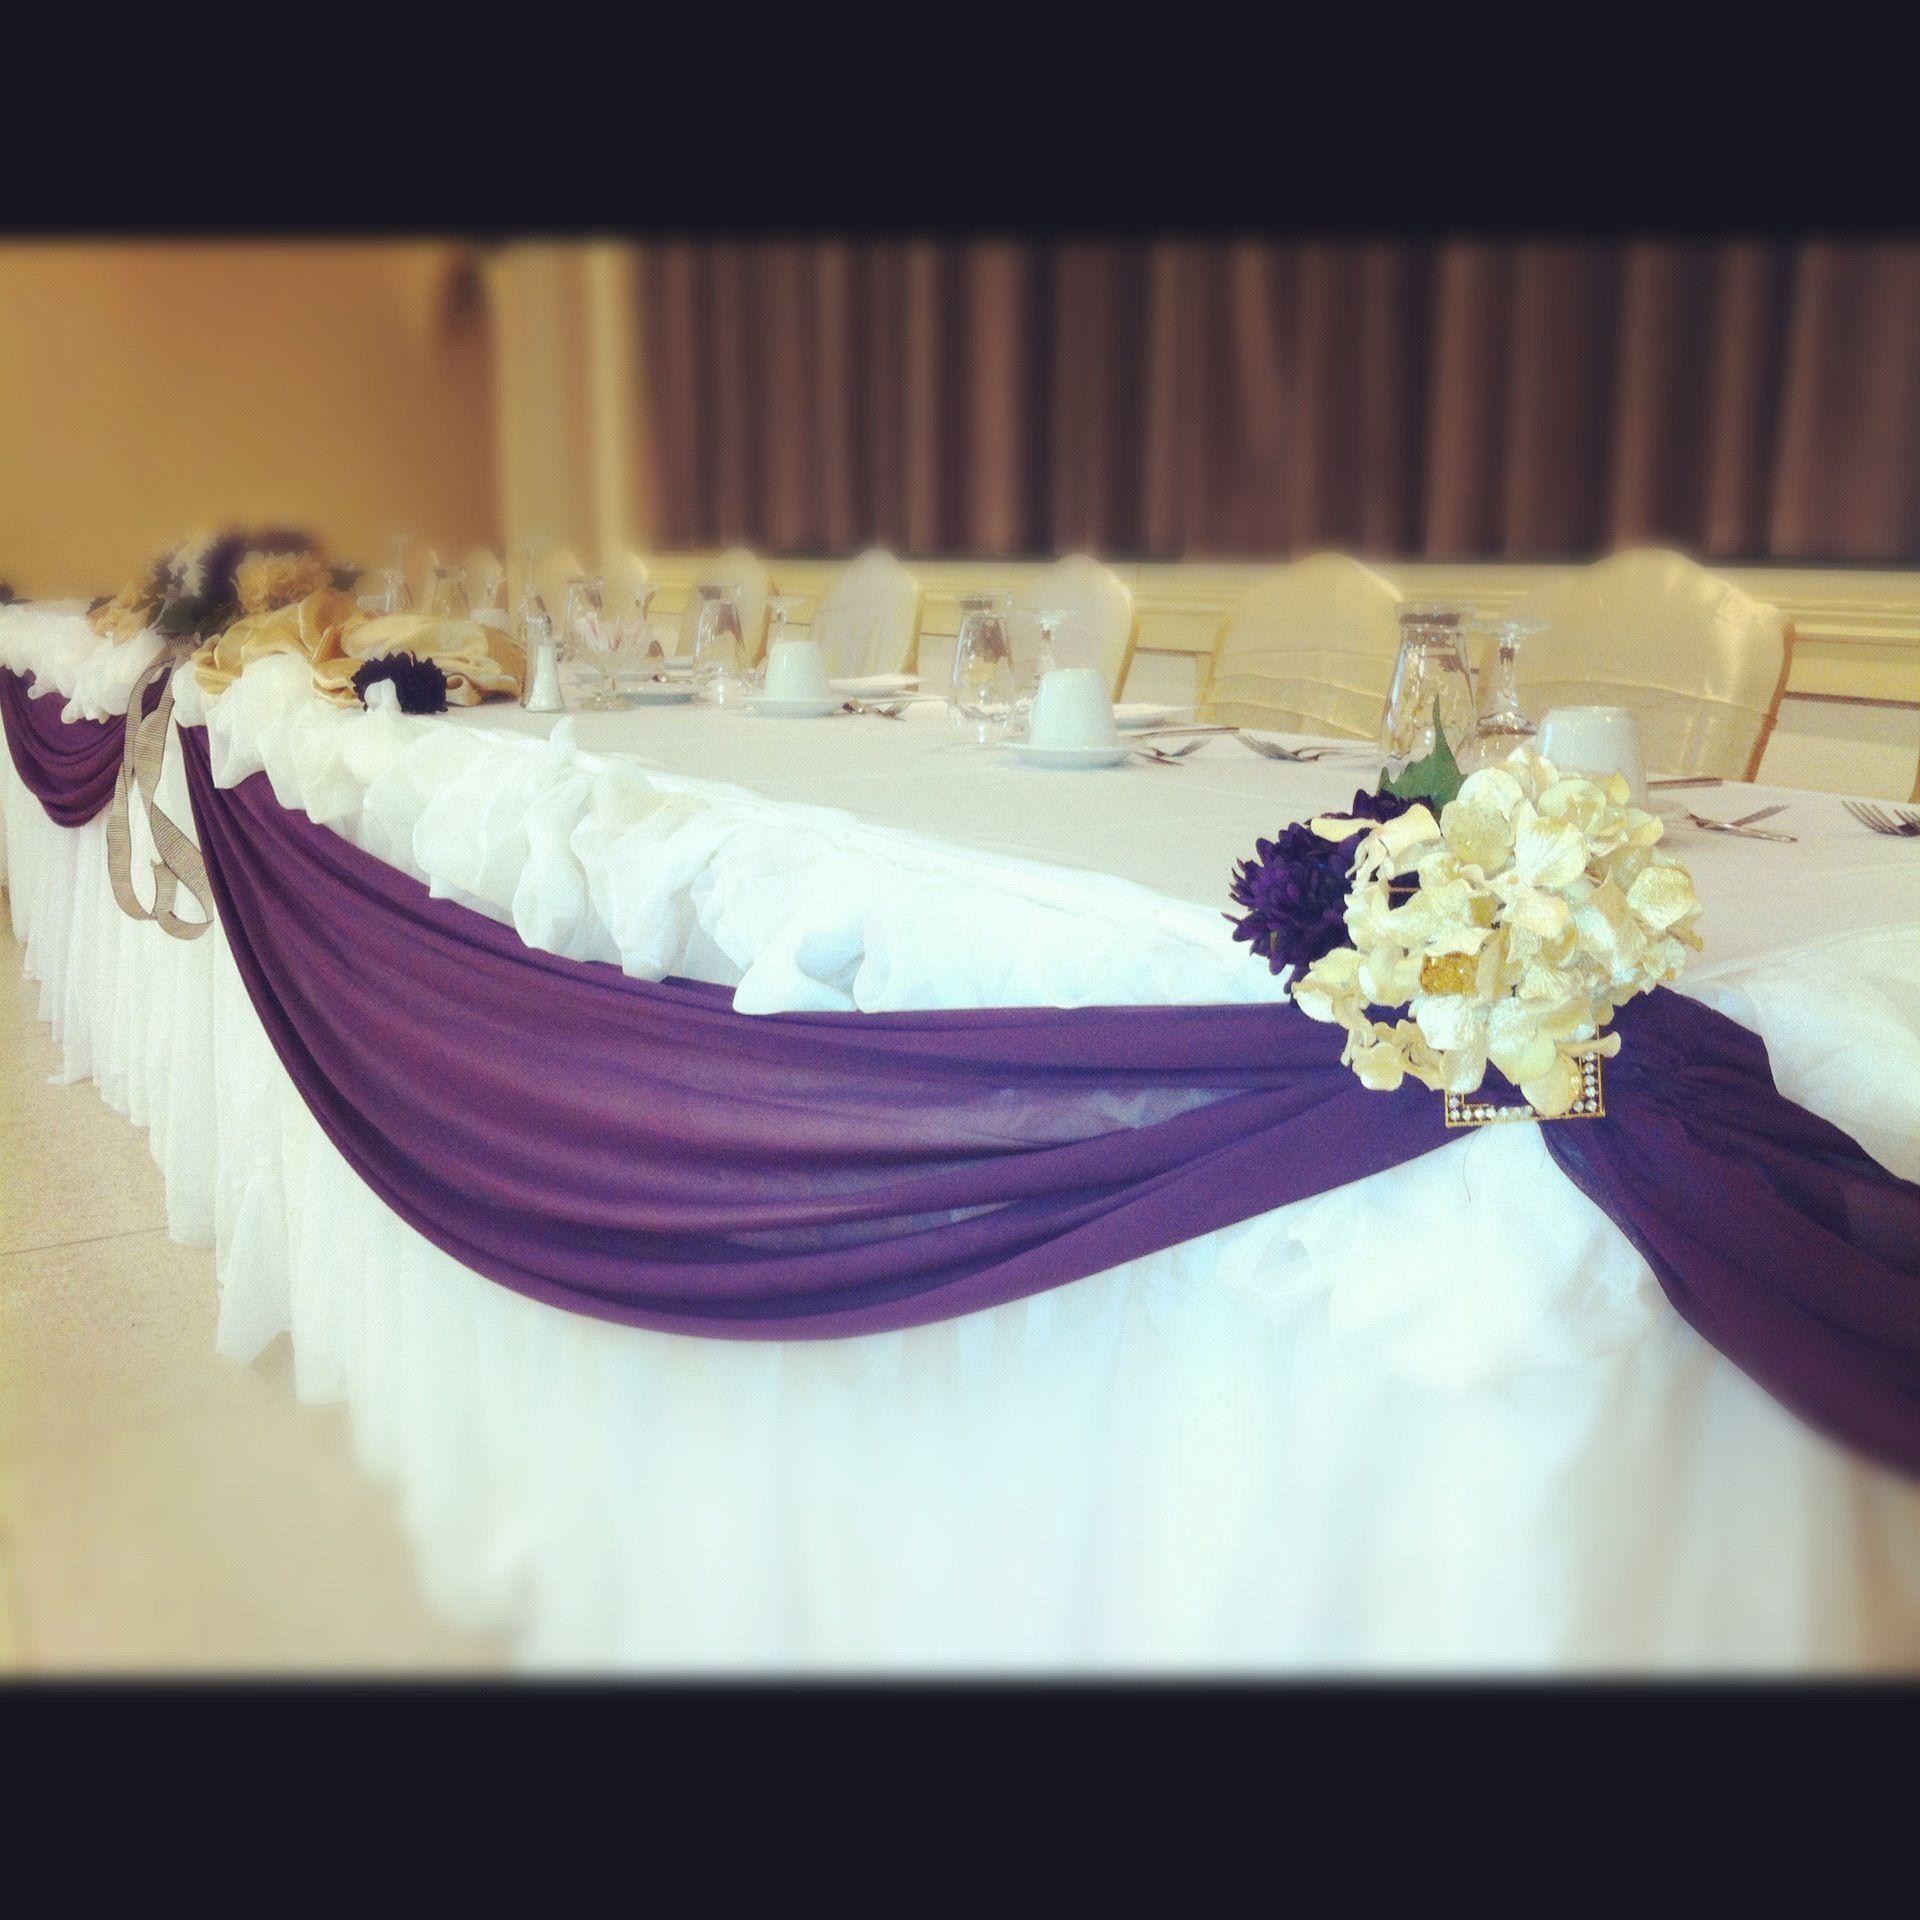 Wedding Reception Head Table Ideas: Elegant Head Table Wedding Decorations. Like The Purple